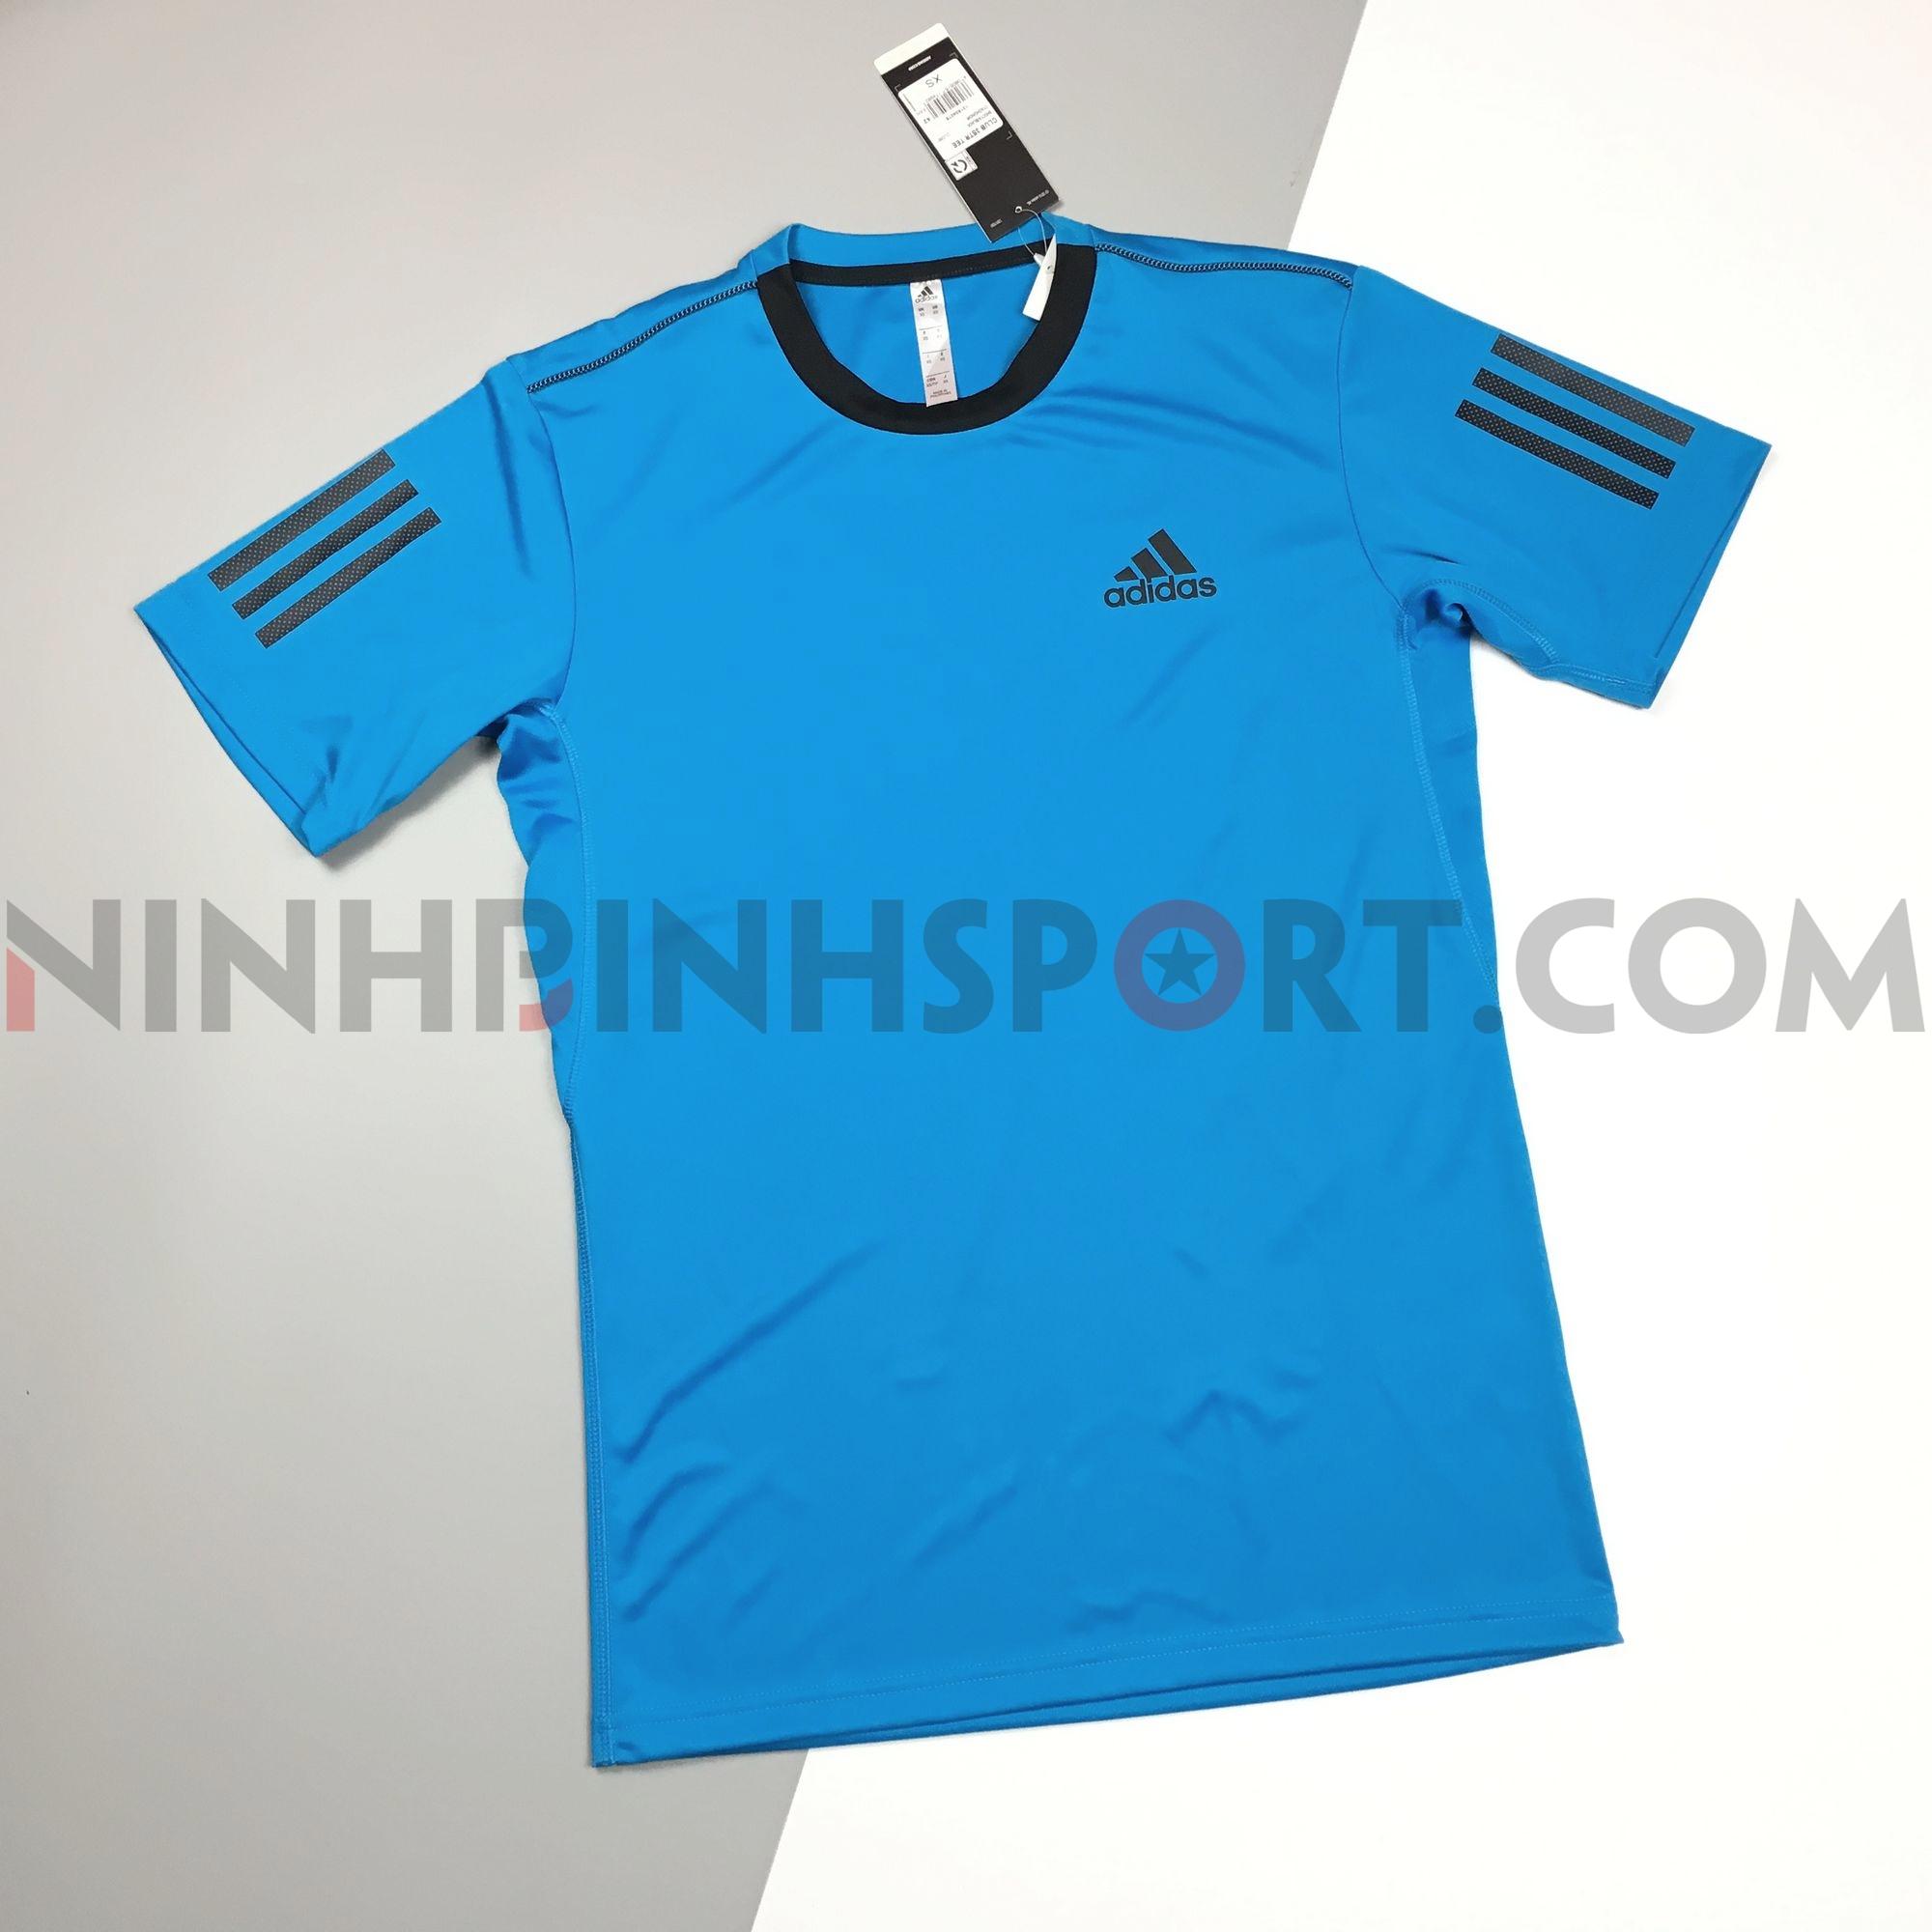 Áo thể thao nam Adidas 3-Stripes Club Tee Blue DU0861